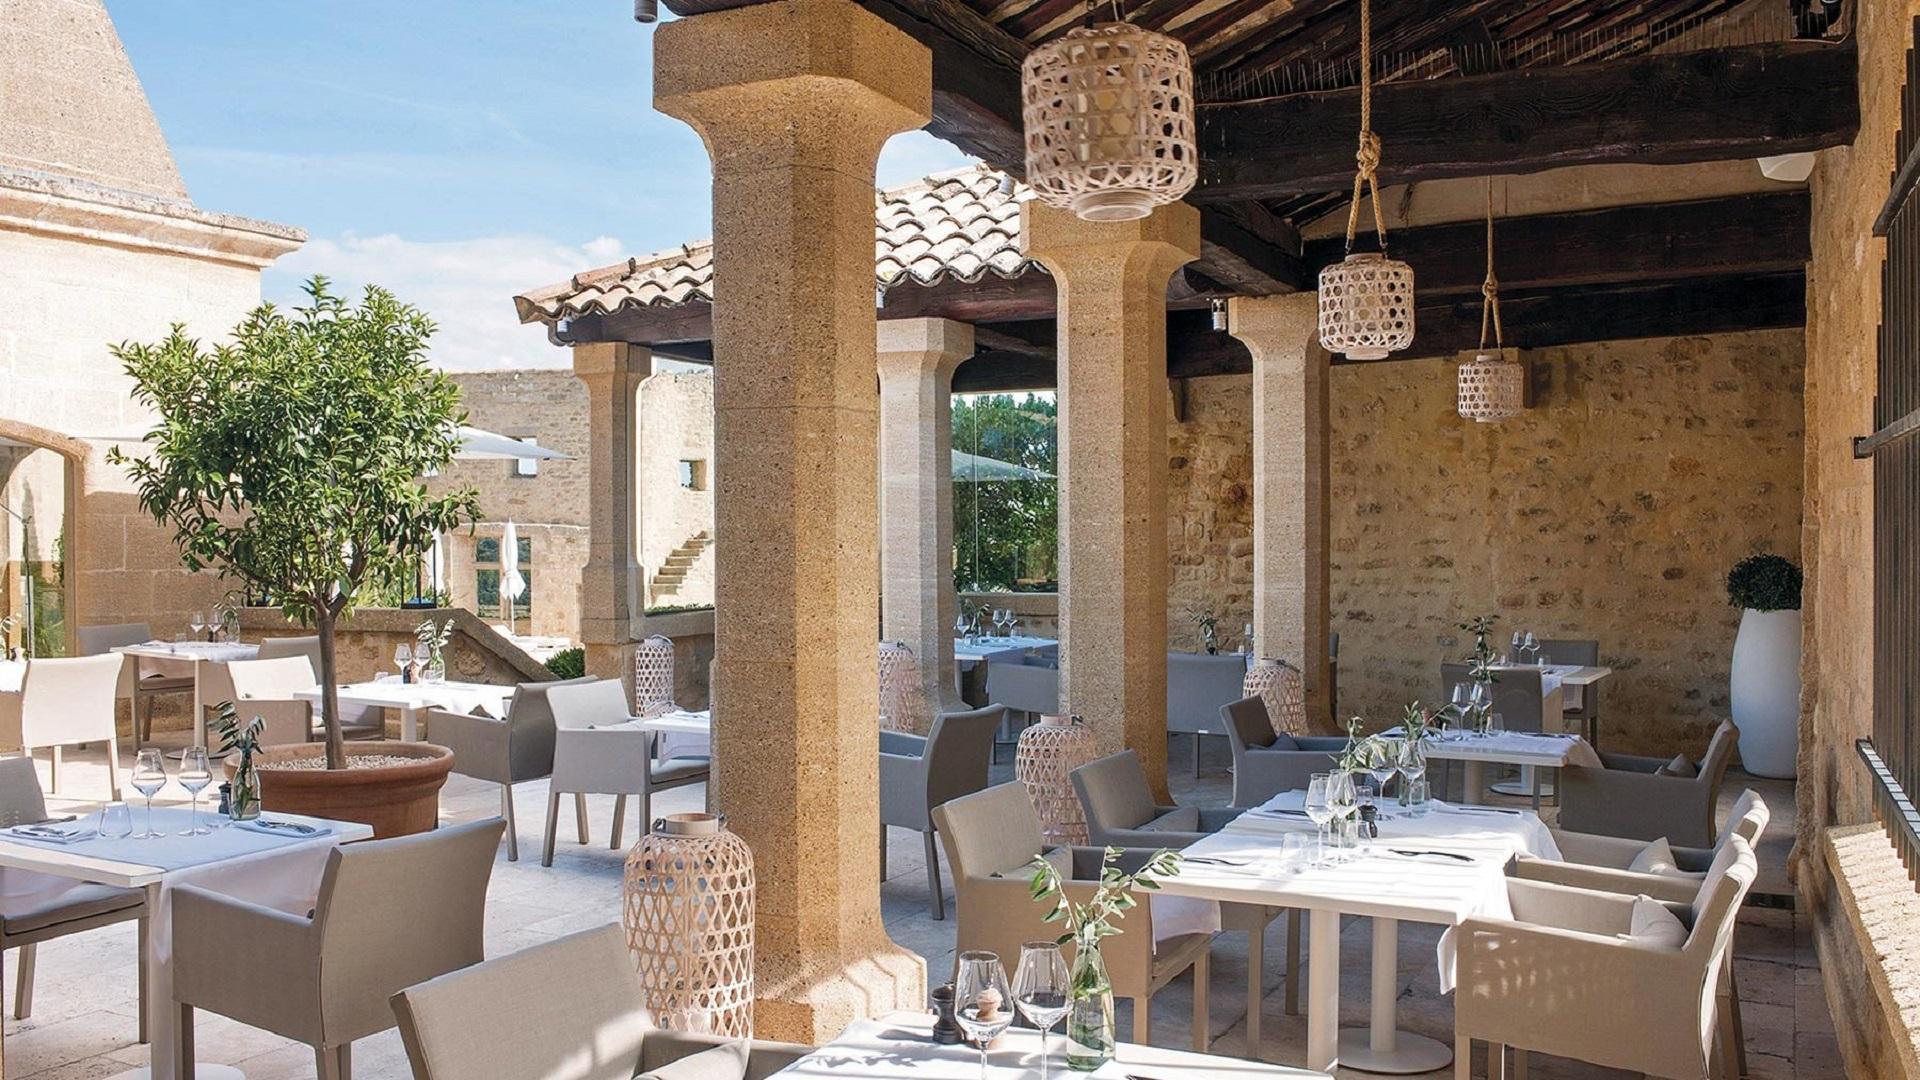 le-vieux-castillon-gard-provence-patio-cour-seminaires-de-caractere